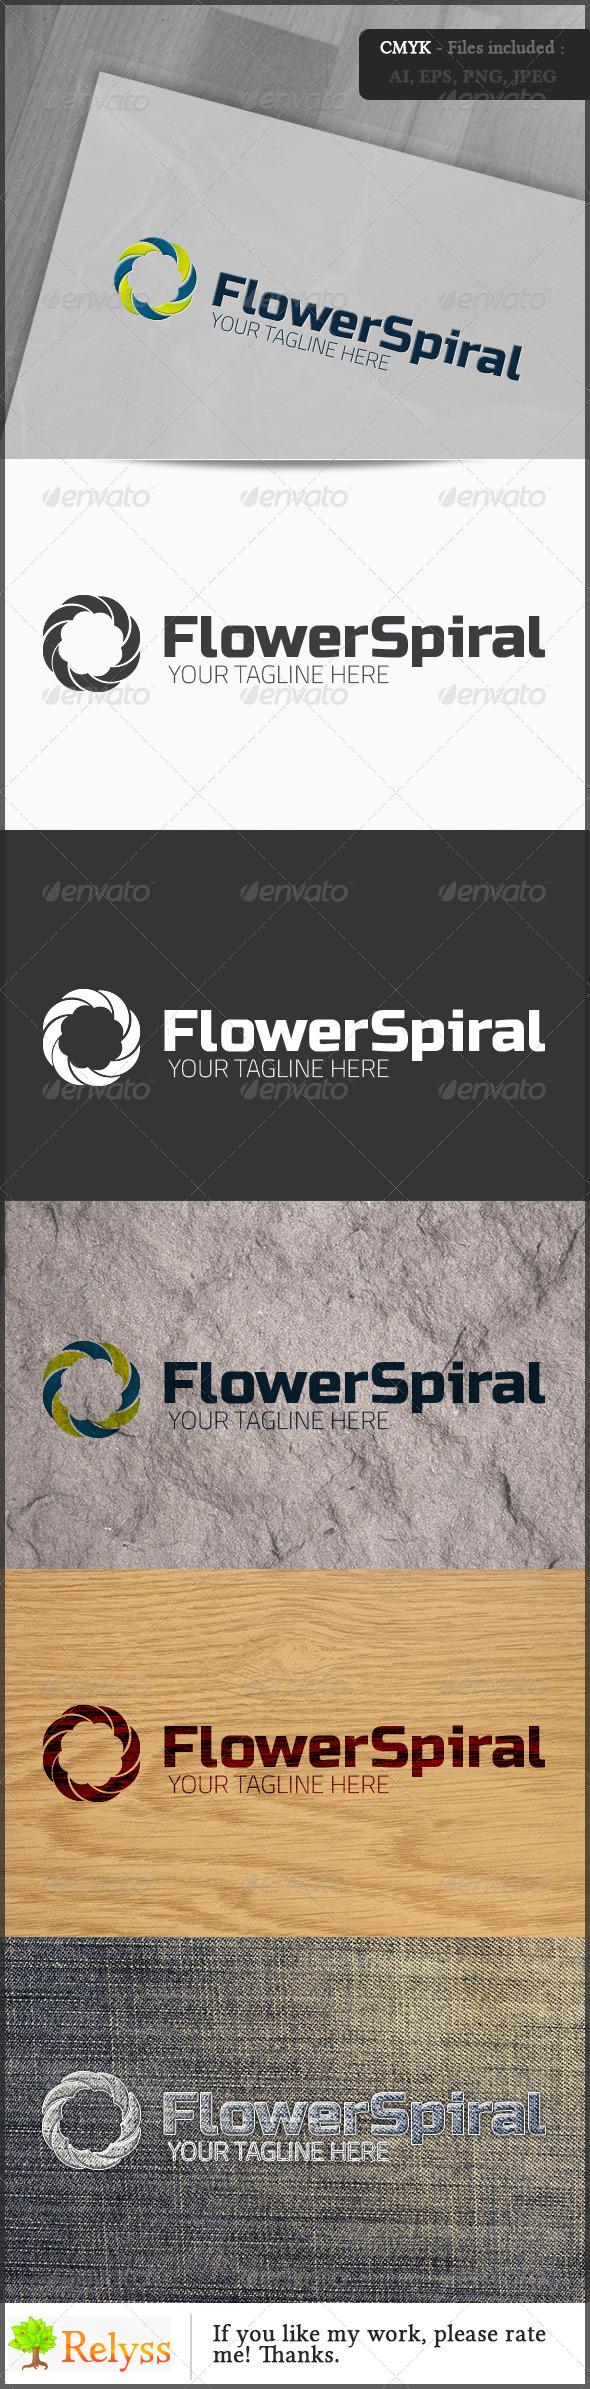 GraphicRiver FlowerSpiral Logo 6837831